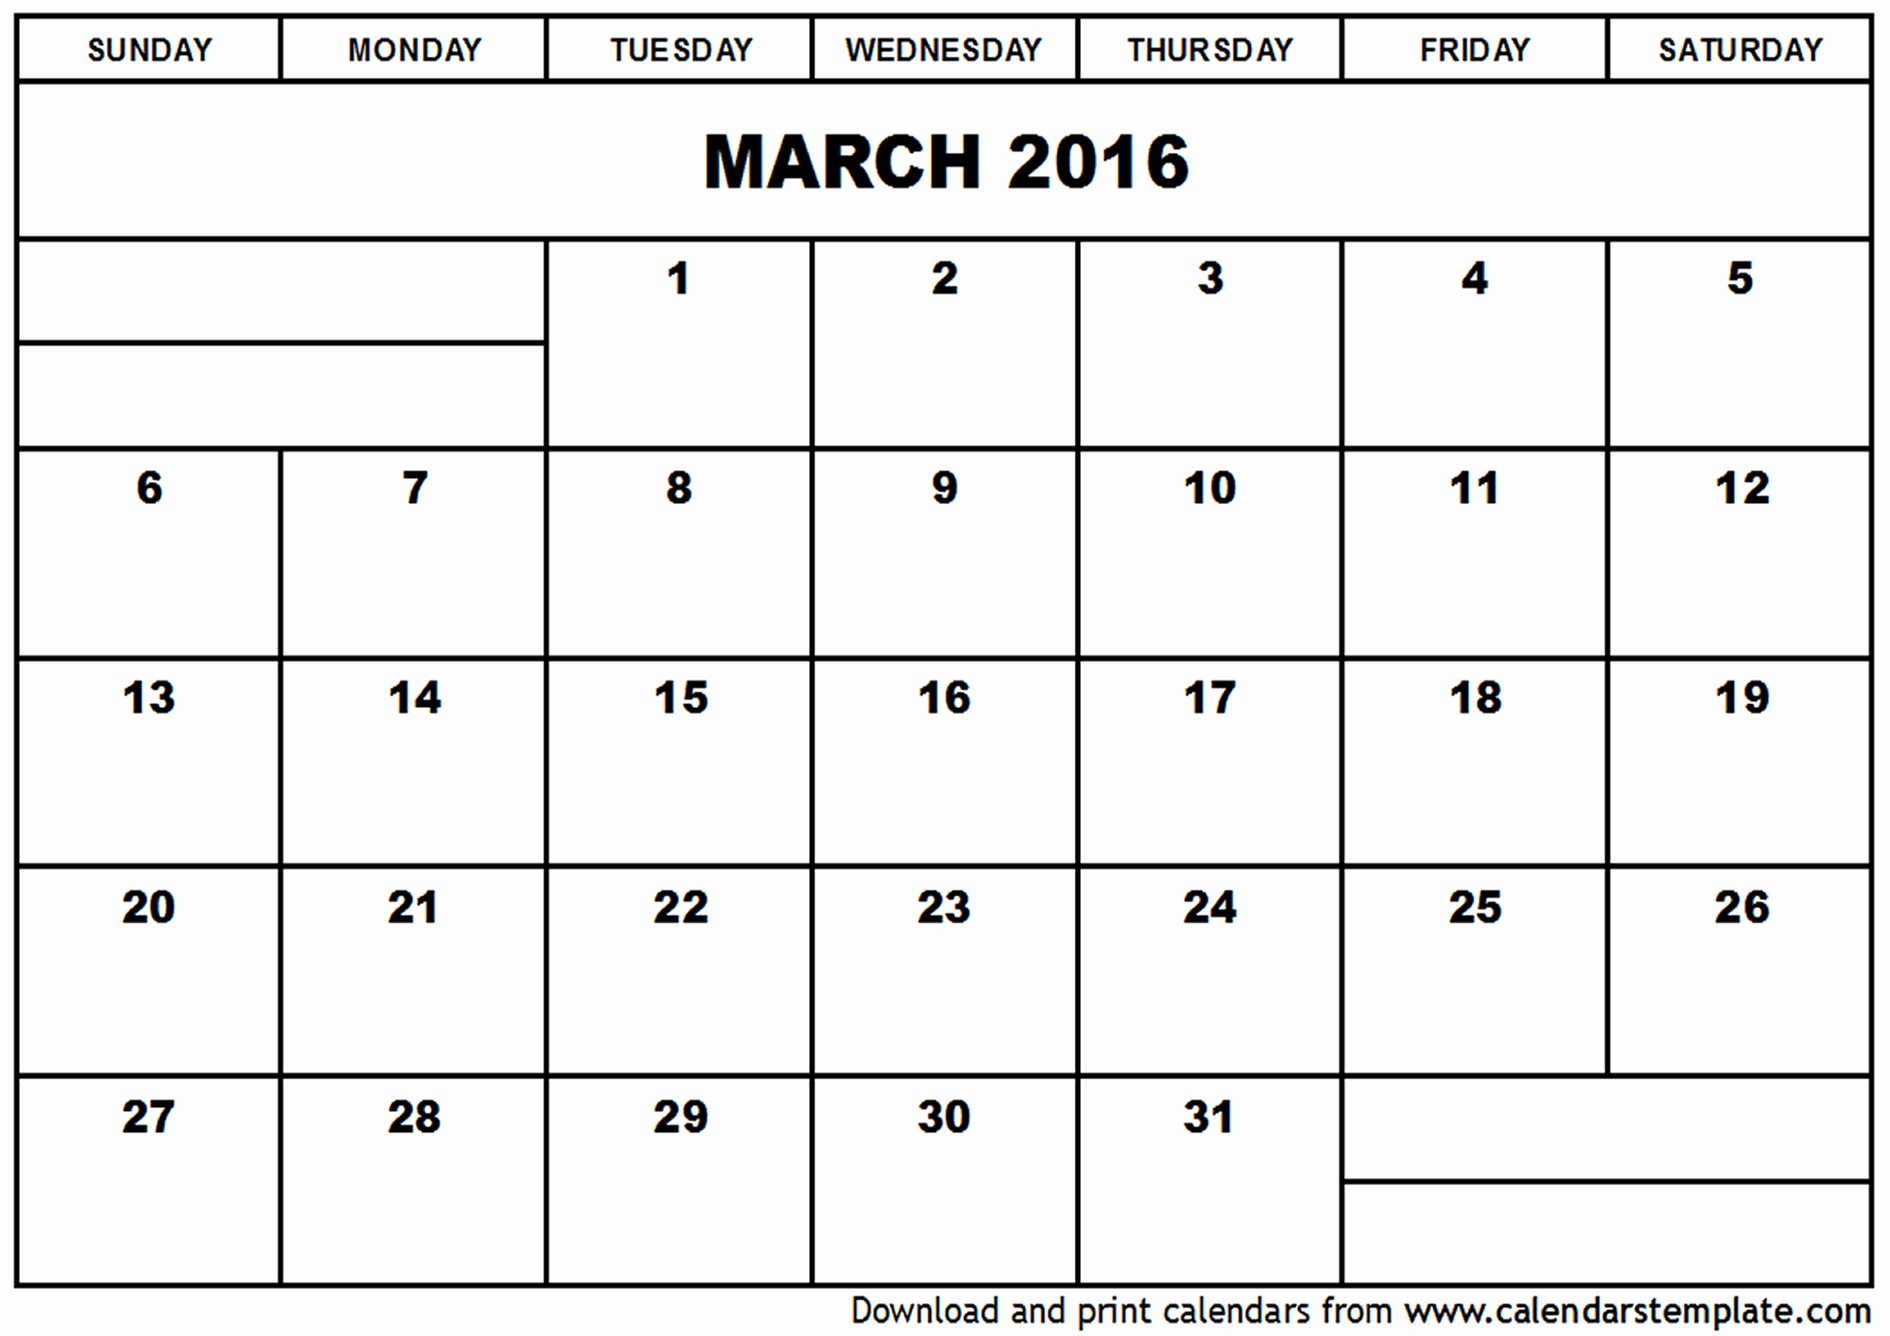 Free Printable Calendar 2016 Templates Best Of March 2016 Calendar Template